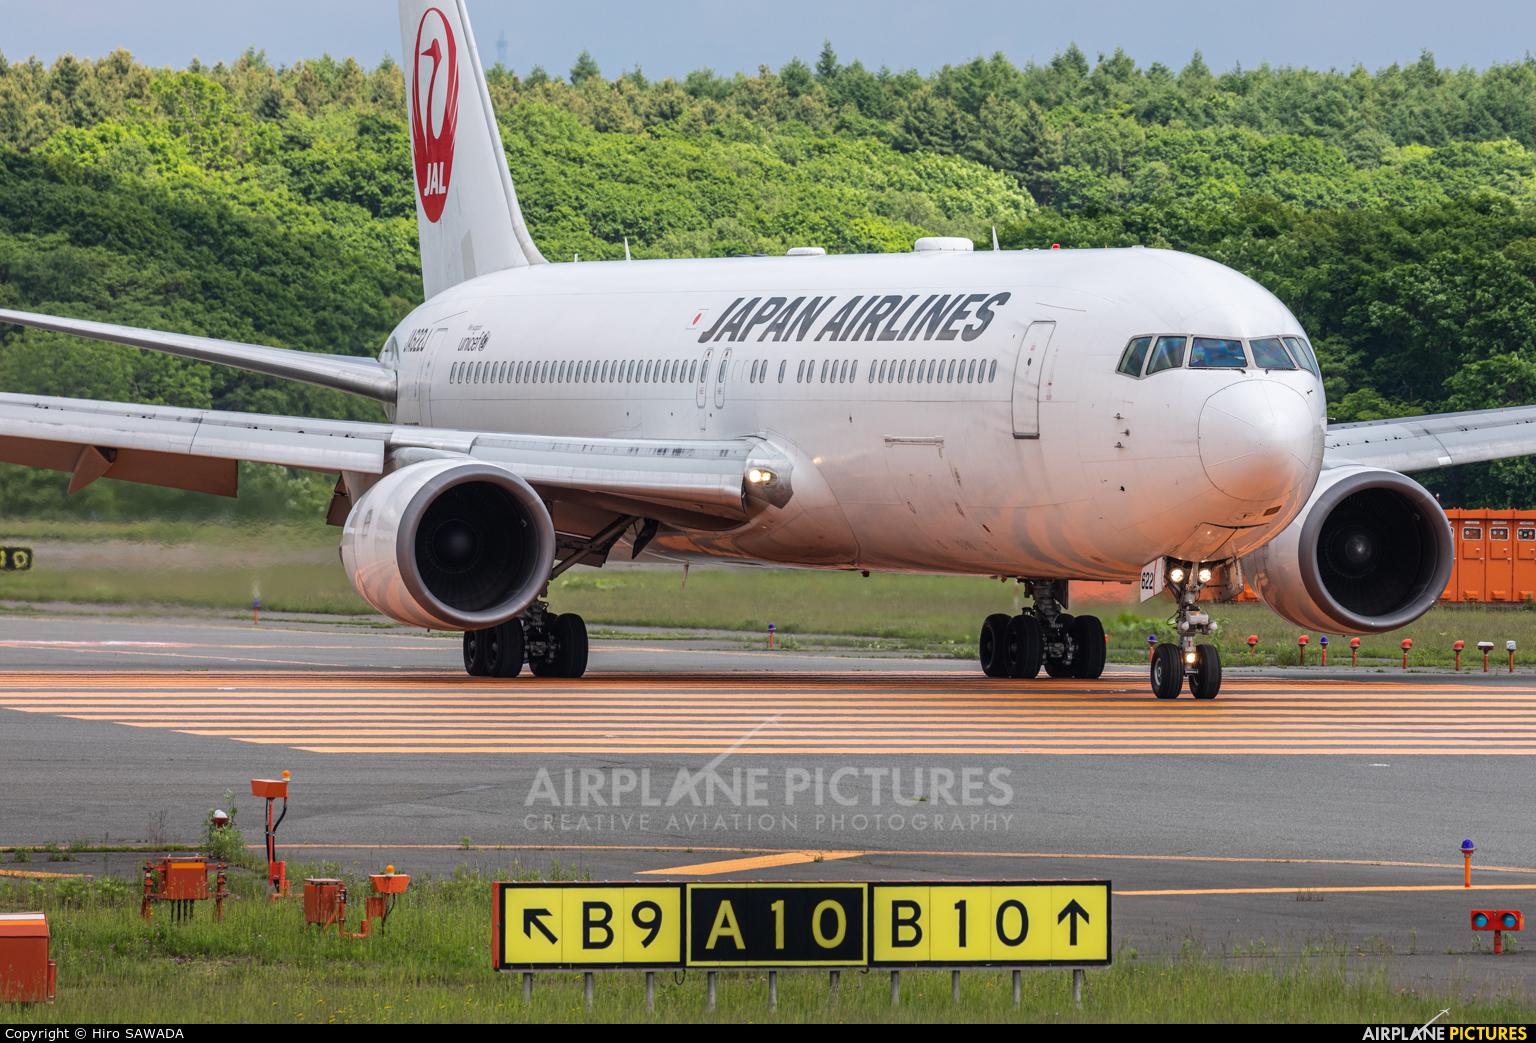 JAL - Japan Airlines JA622J aircraft at New Chitose